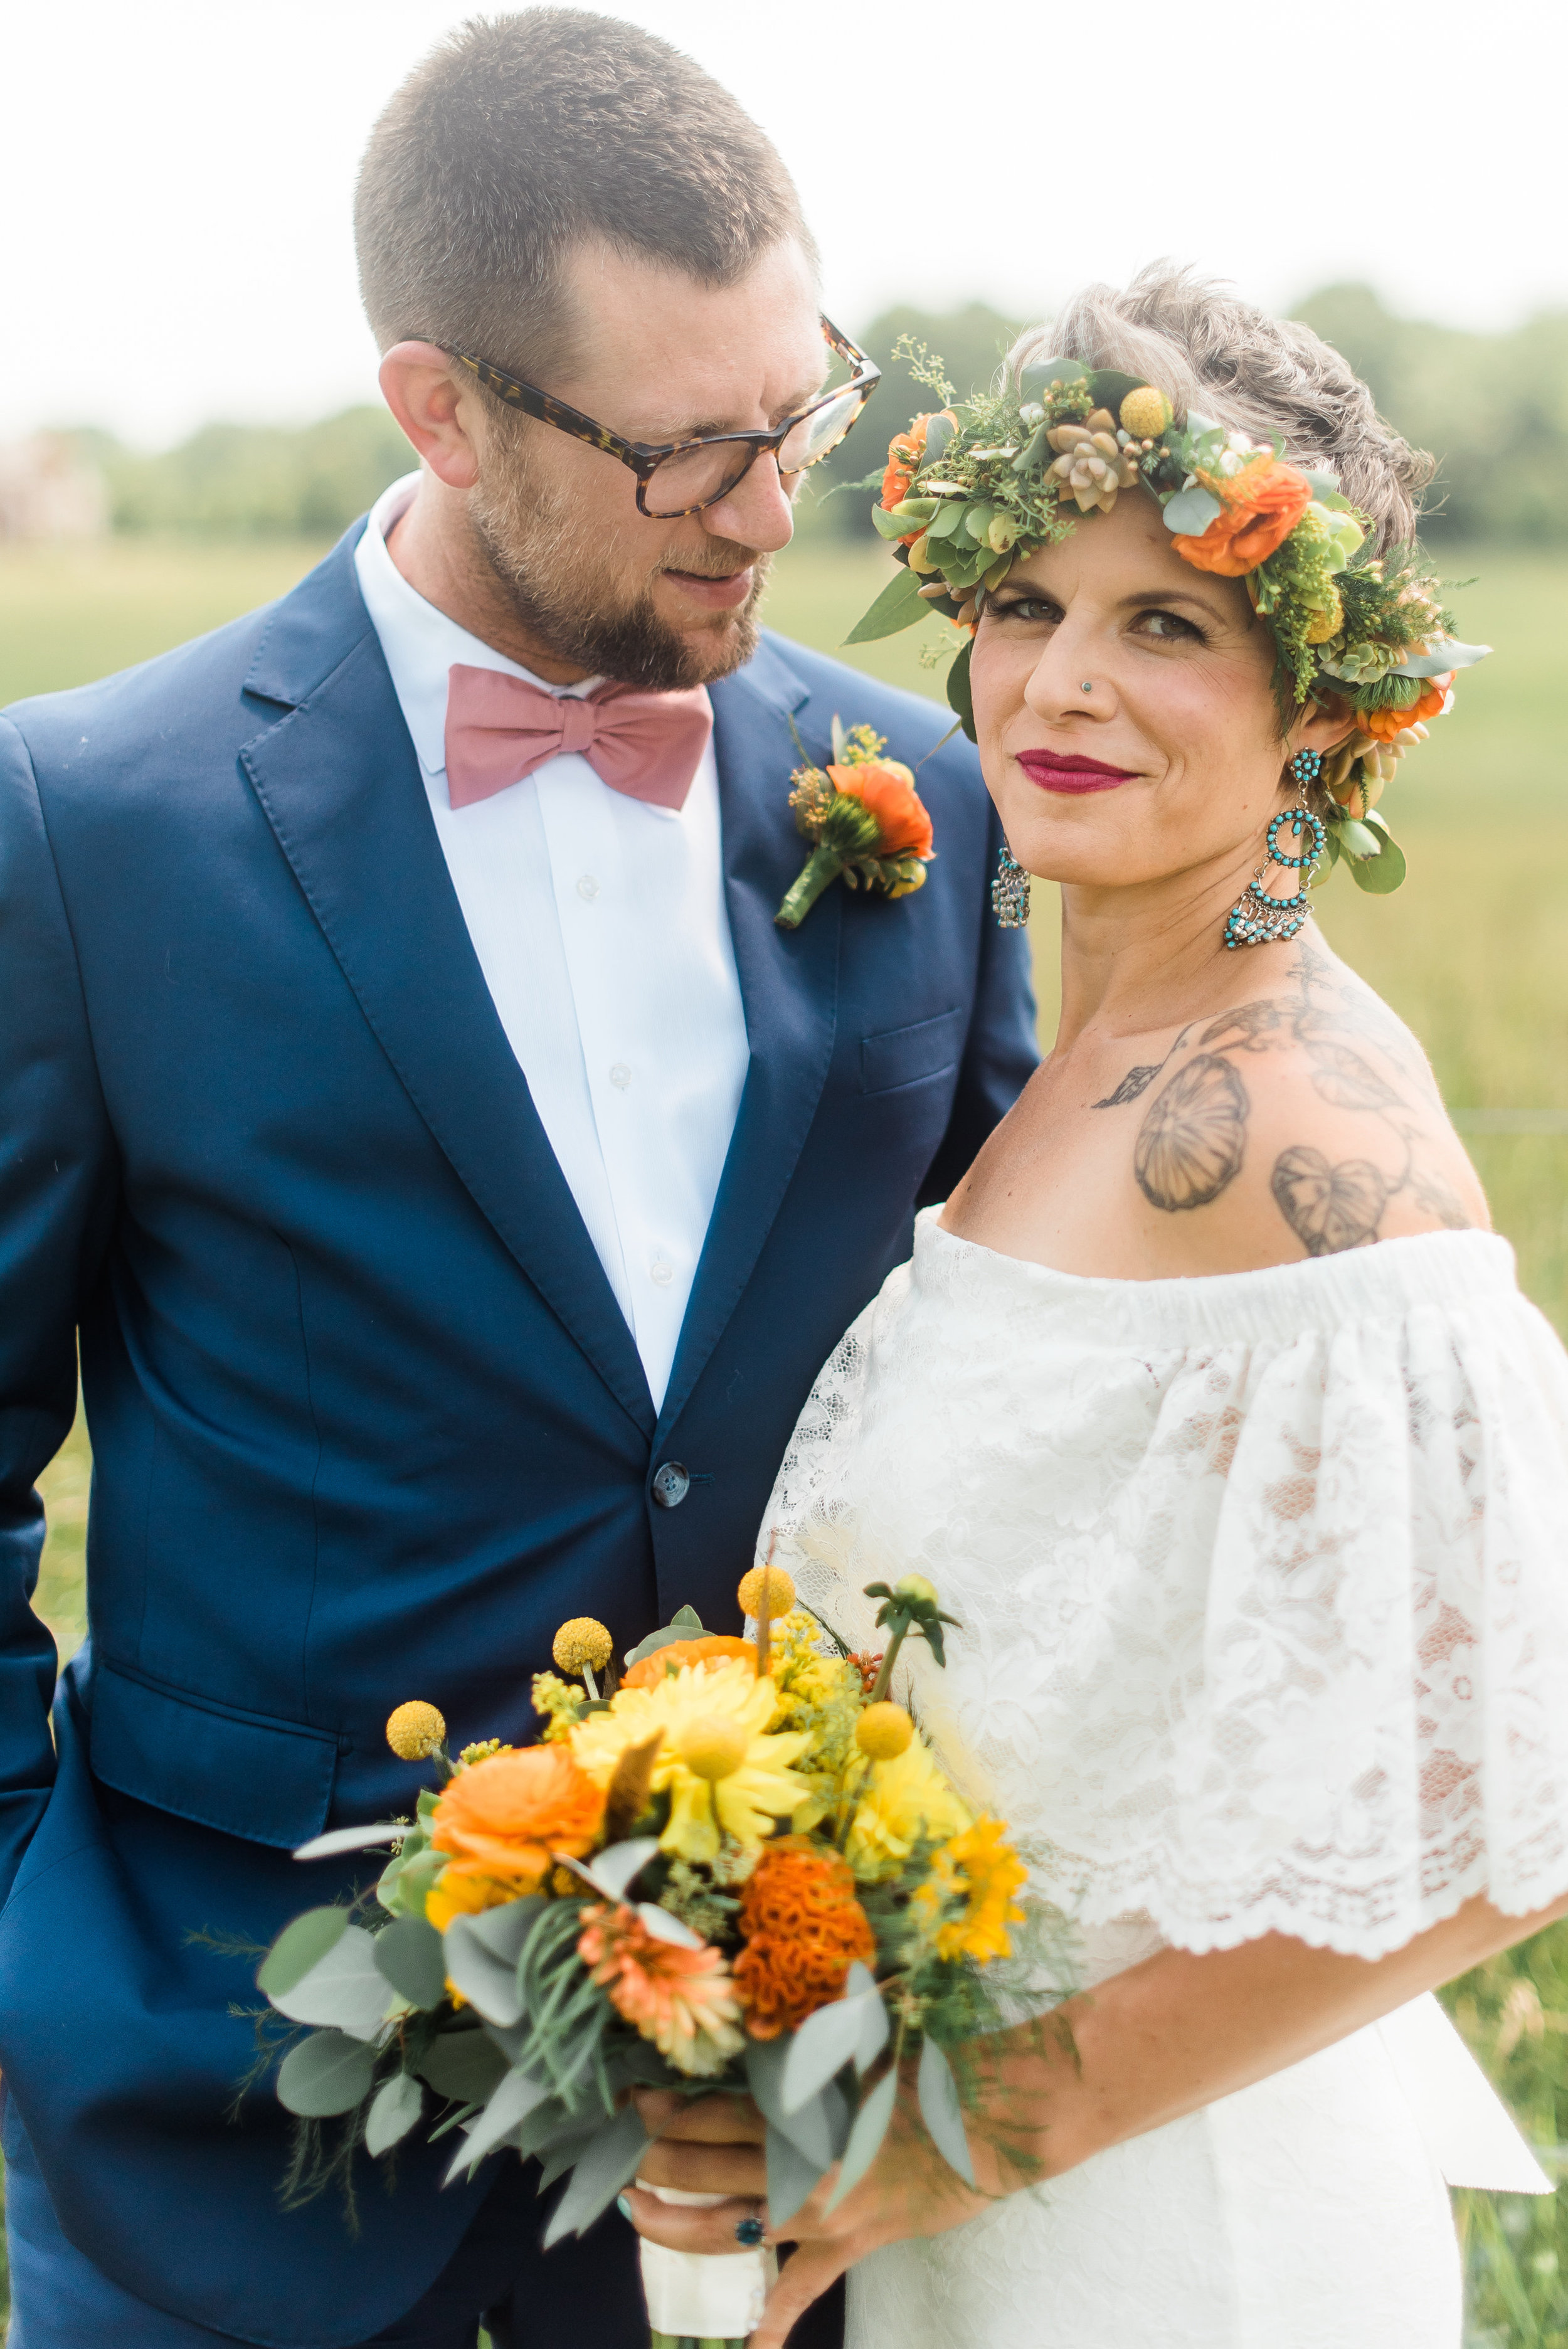 pittsburgh-wedding-photographer-armstrongfarms-eclectic-offbeat-boho0141.jpg